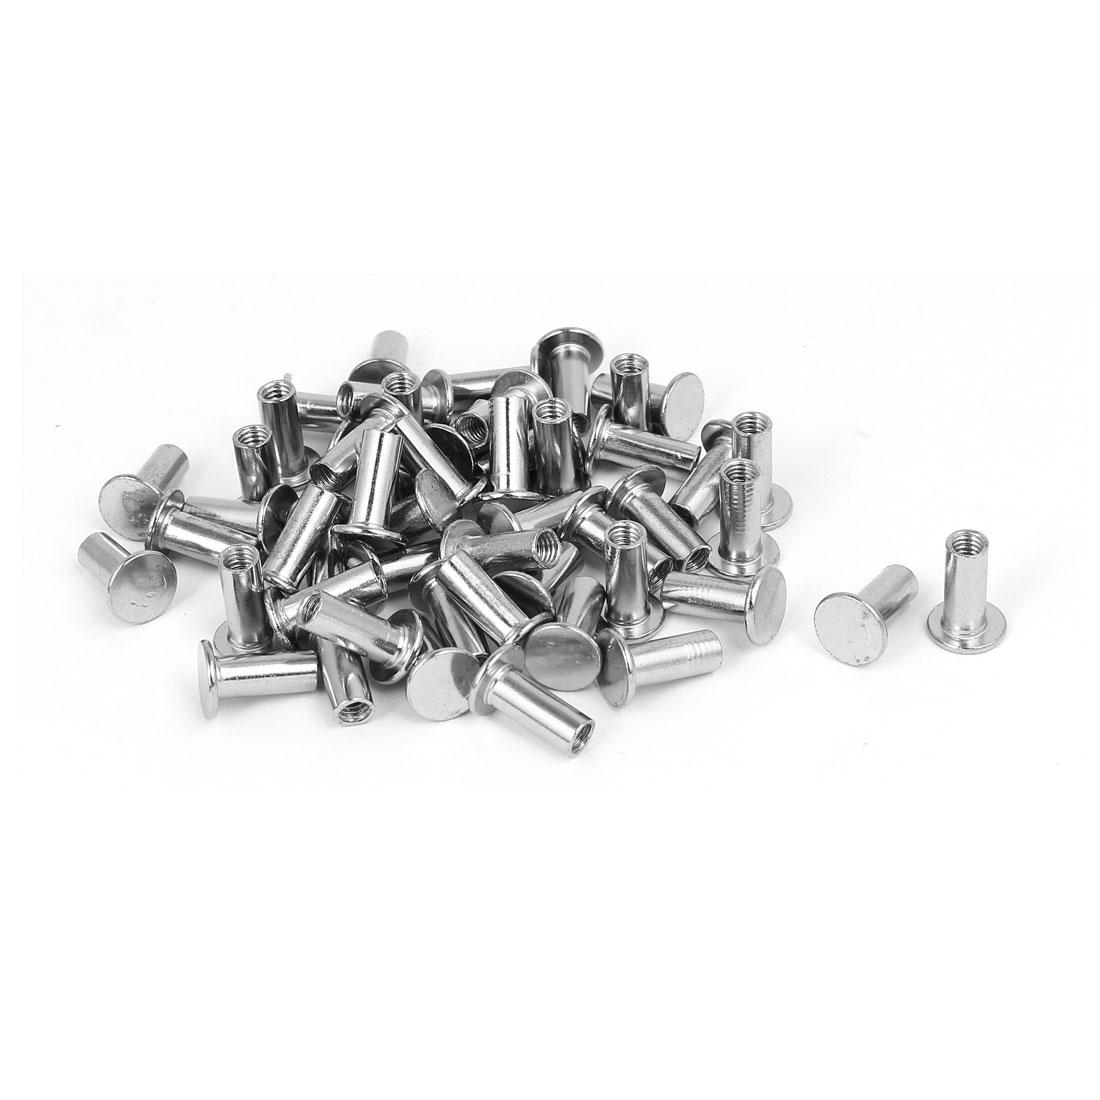 Photo Album Metal Nickel Plated Binding Screw Post Barrel Nut 5mmx12mm 52pcs